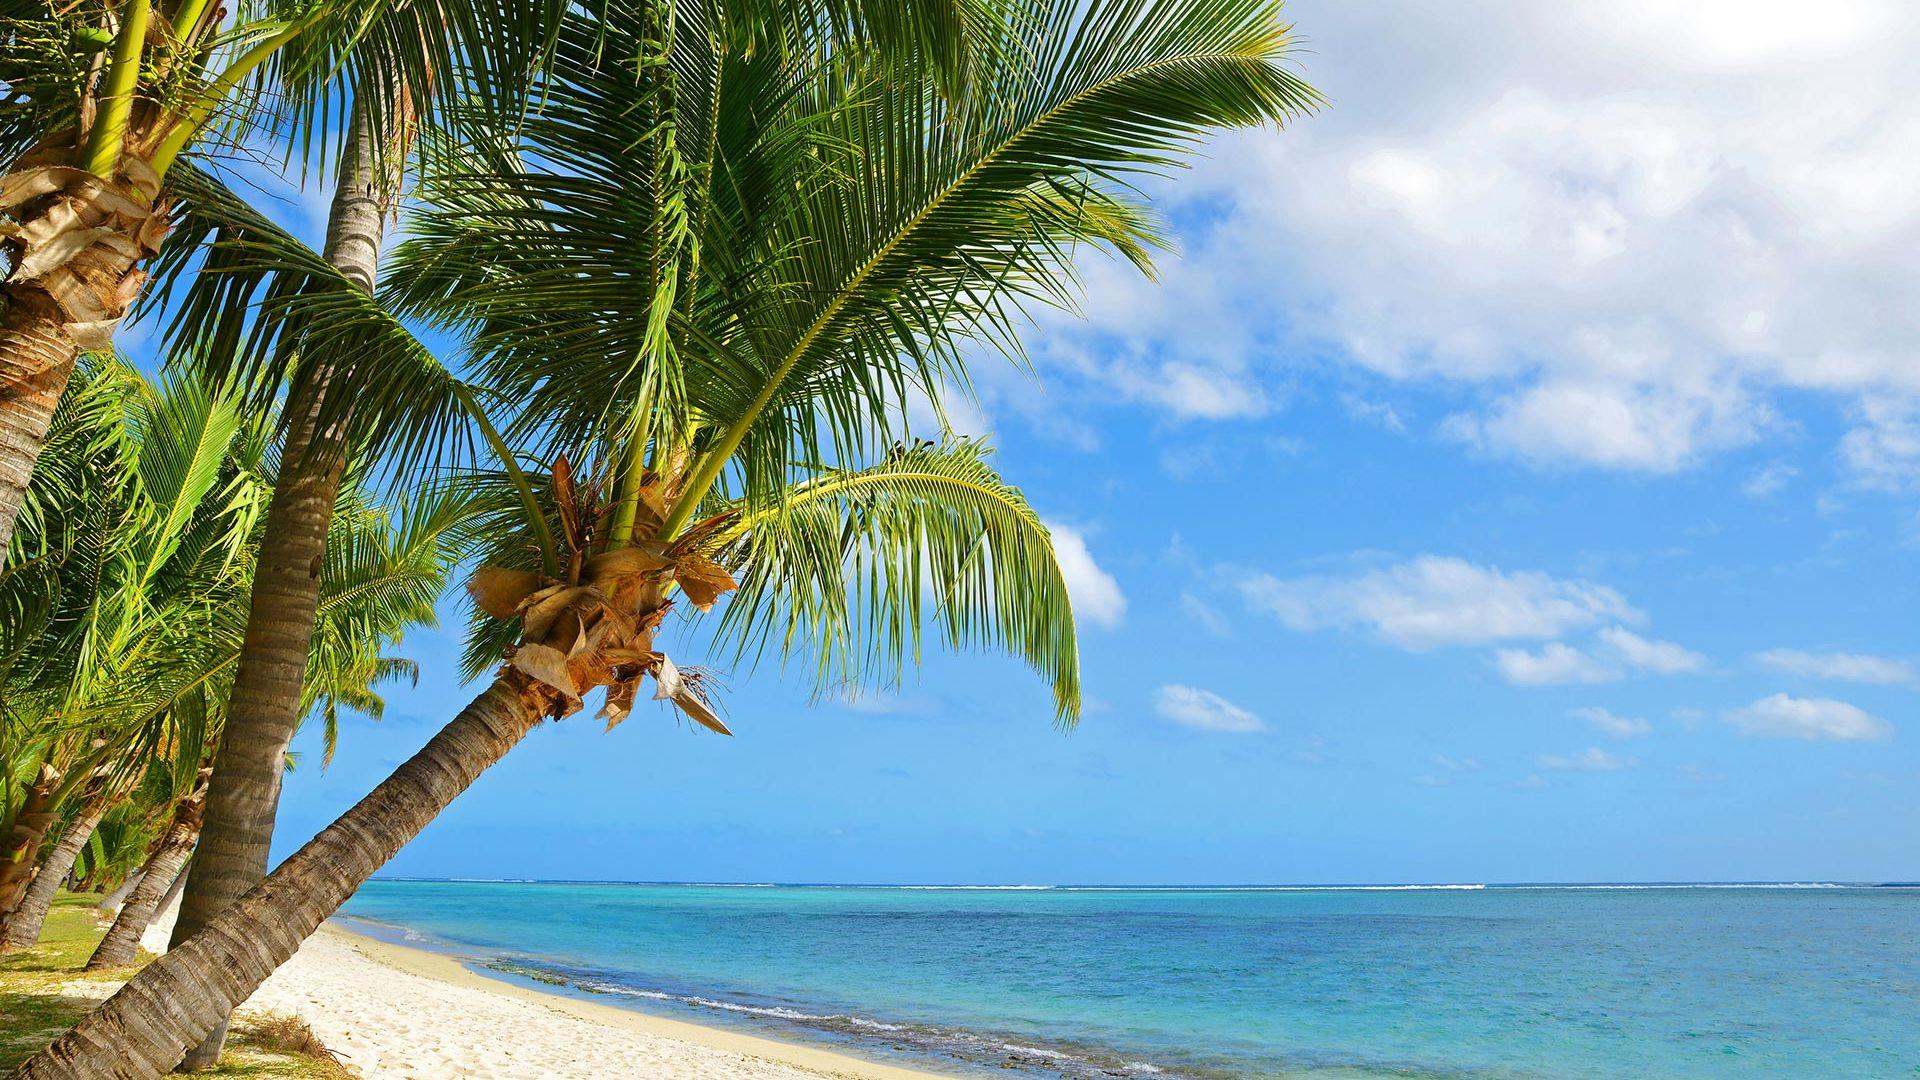 Oferta de weekend - Sejur plaja Mauritius, 10 zile - 26 noiembrie 2021